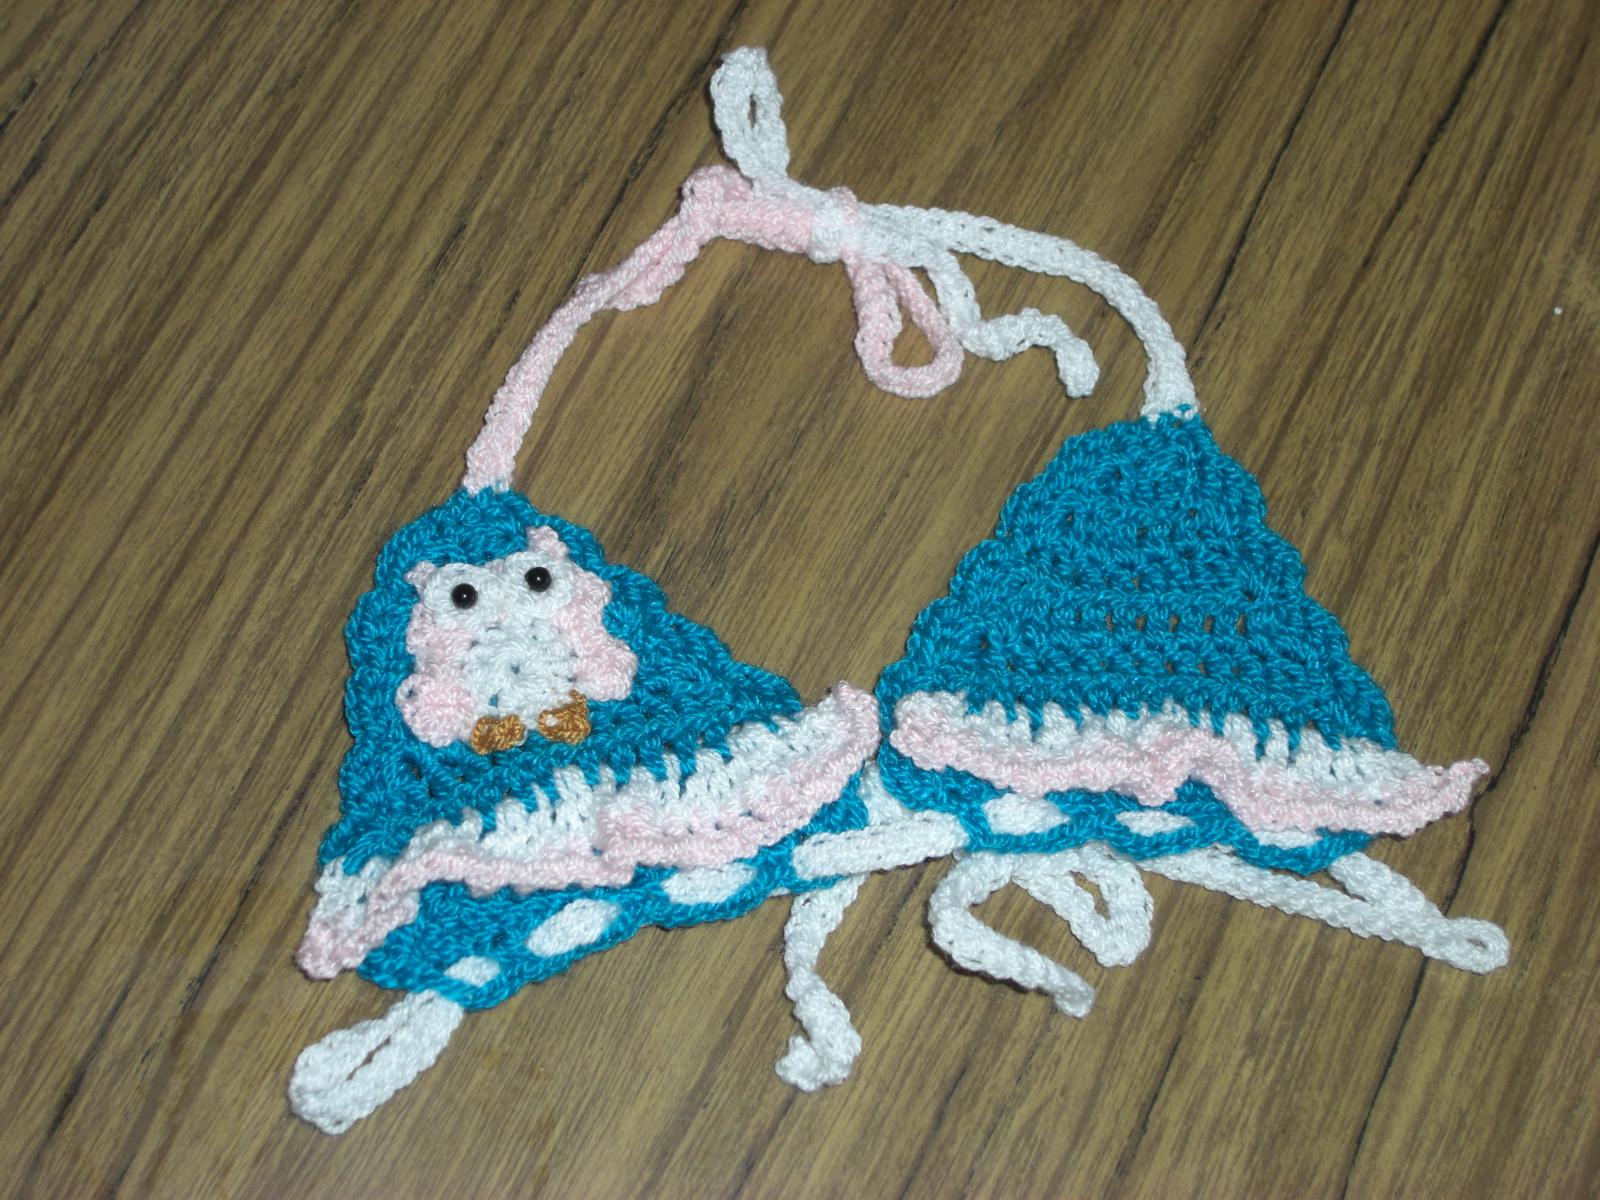 Lenceria De Baño Tejida A Crochet: les traigo este traje de baño ...